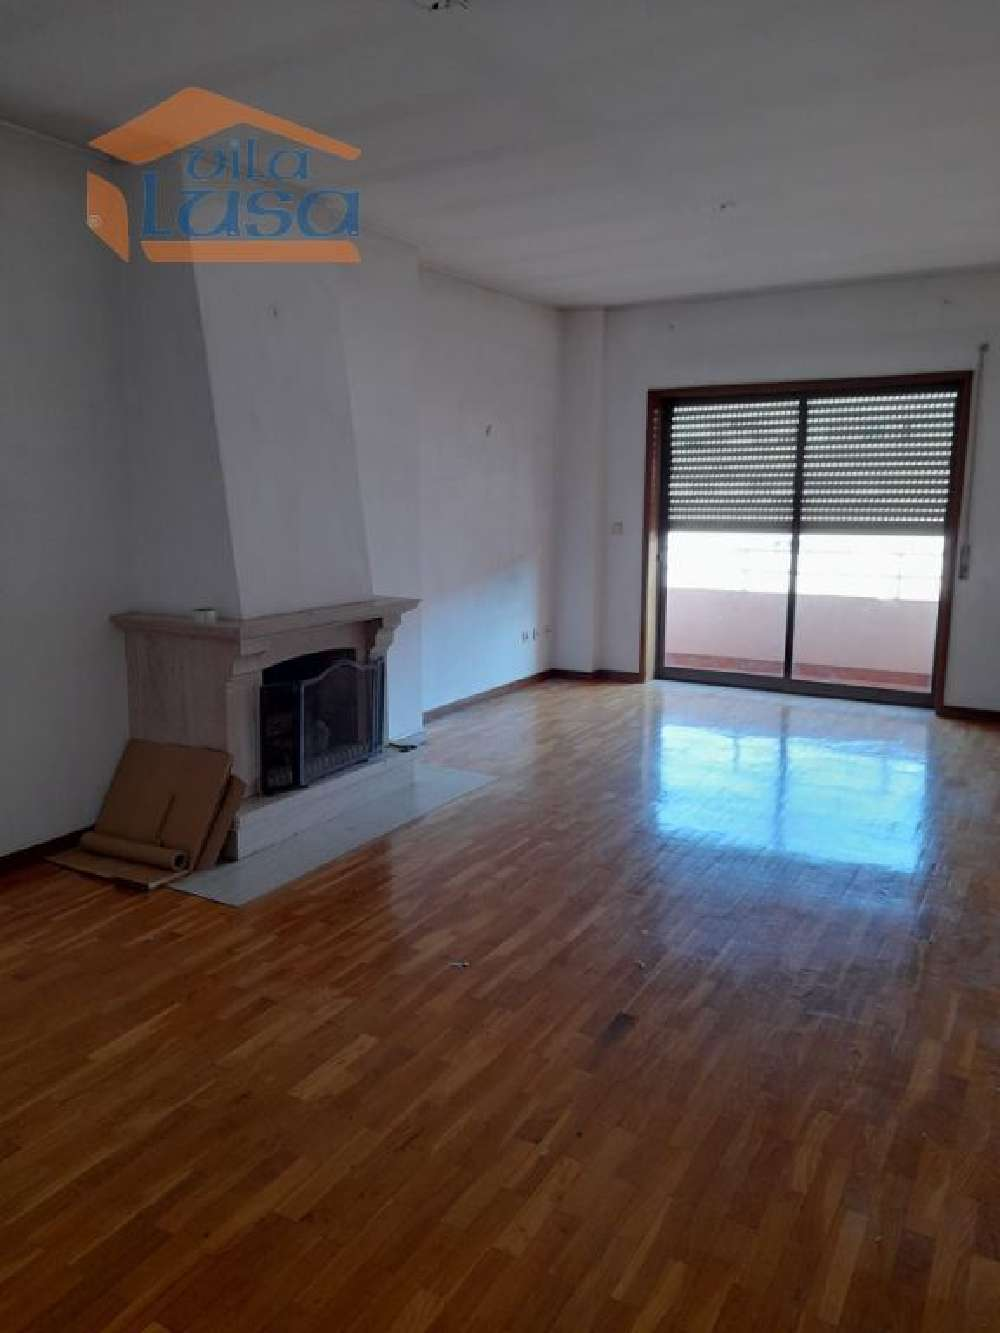 São Pedro Nordeste 公寓 照片 #request.properties.id#